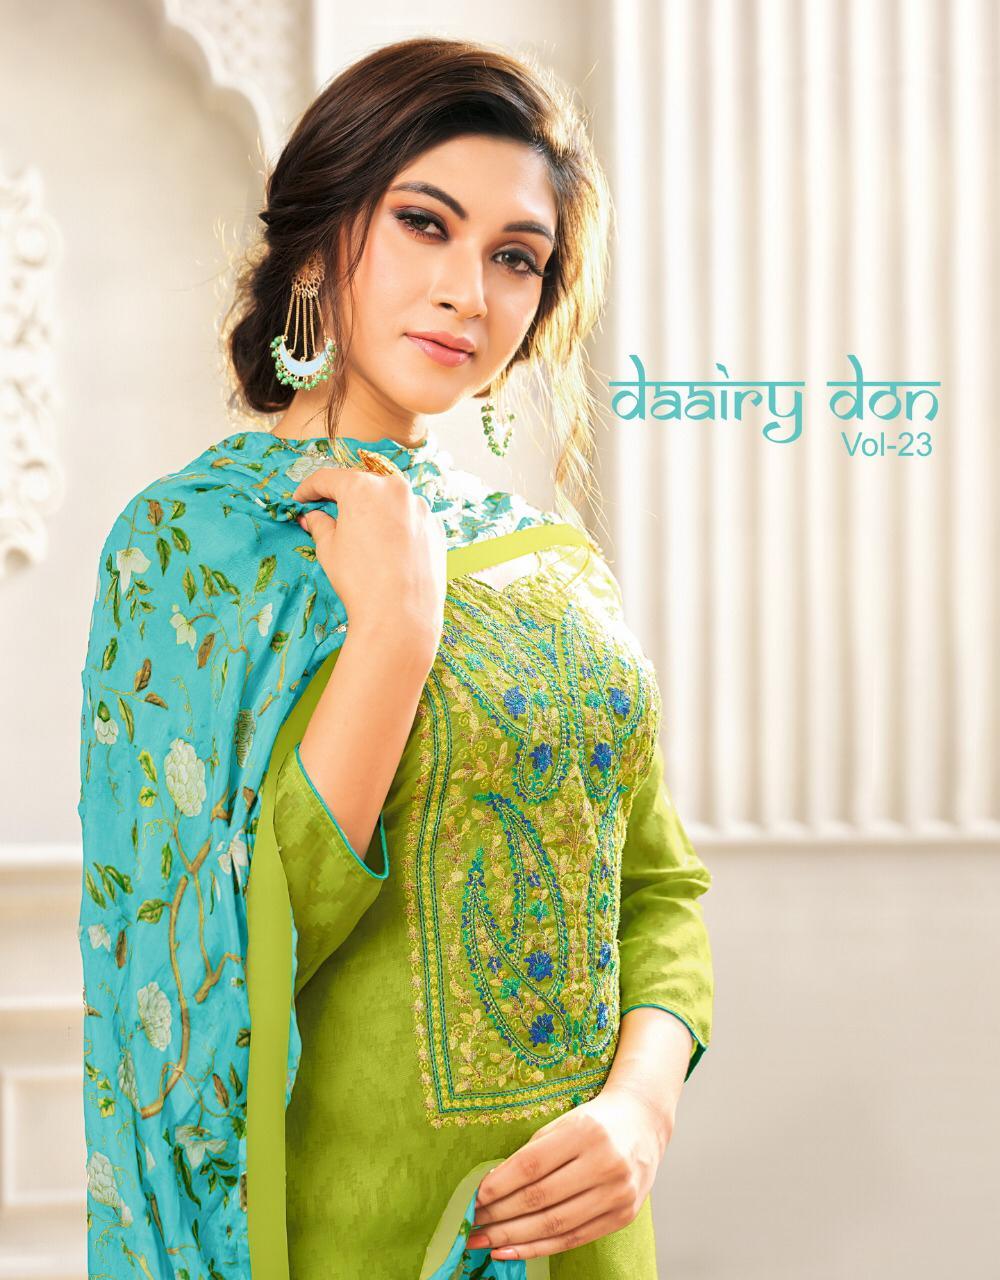 Kapil Trendz Dairy Don Vol 23 Jacquard Cotton Daily Wear Salwar Suit Seller